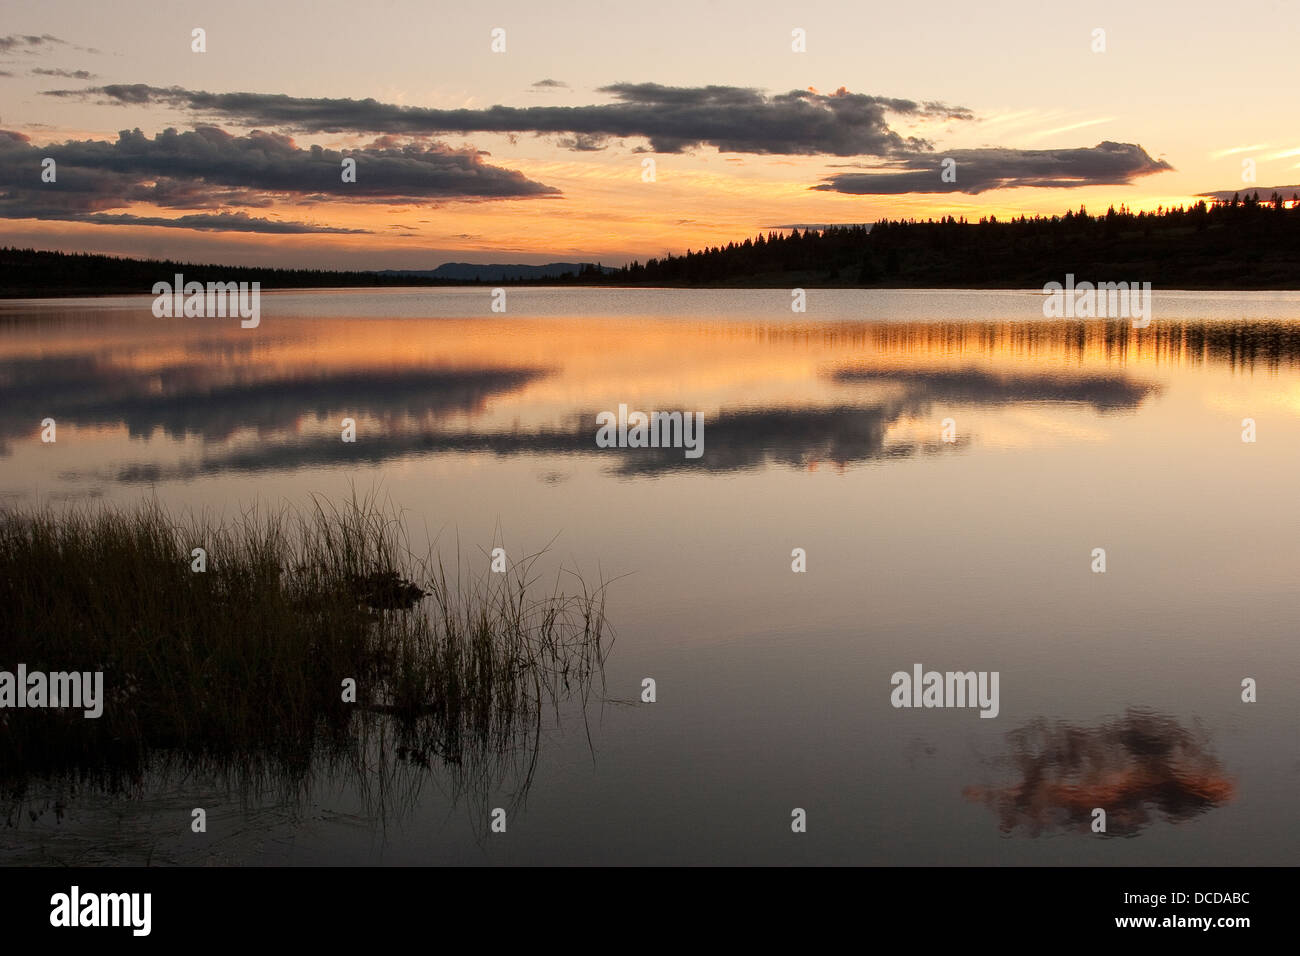 Un Abendstimmung einem ver en Skandinavien, Sonnenuntergang Norwegen, humor, noche en un lago en Escandinavia, Noruega, sundown Foto de stock